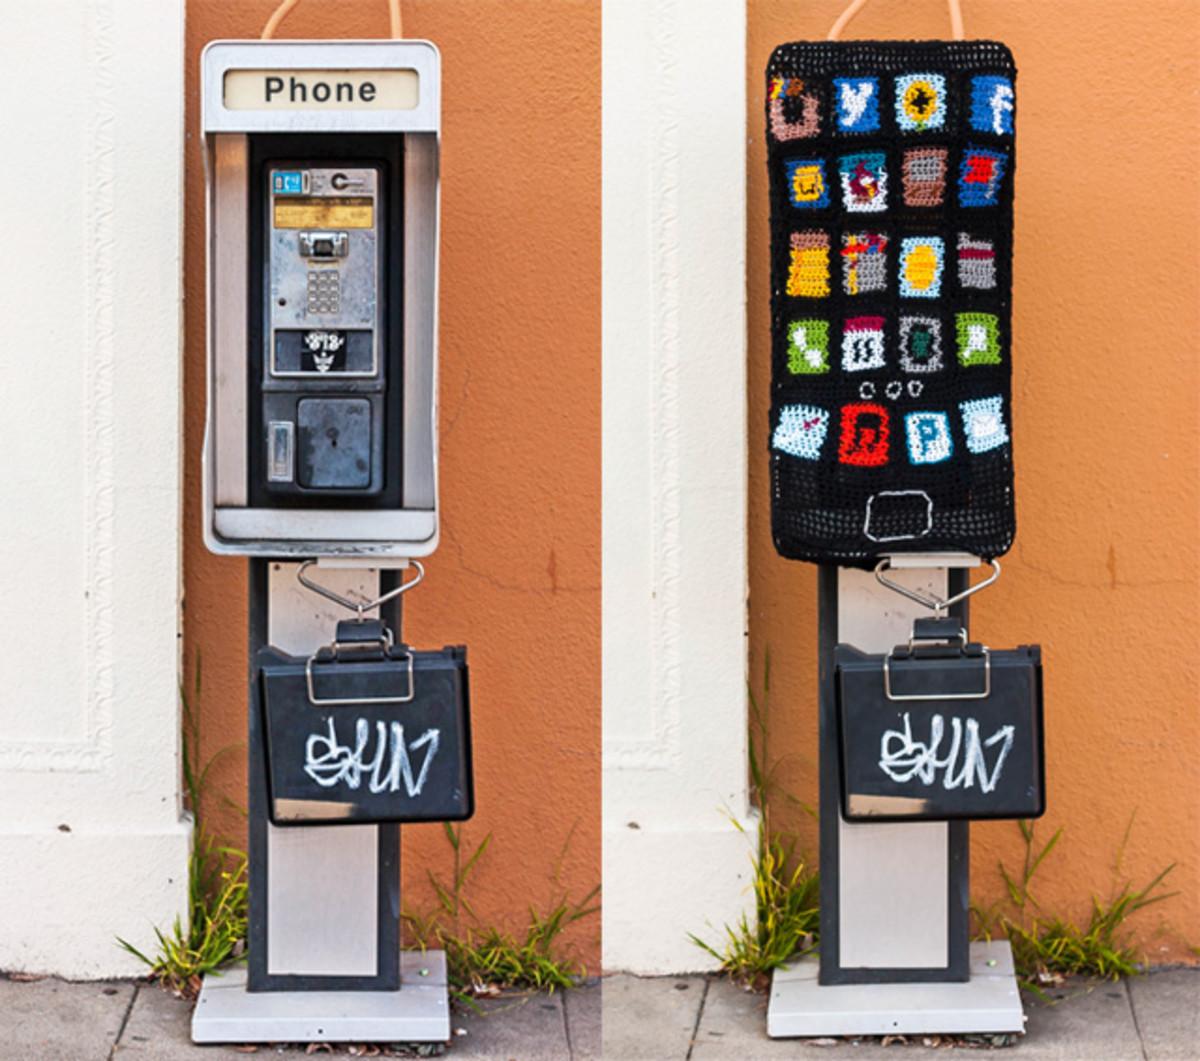 Yarnbombed phone booth